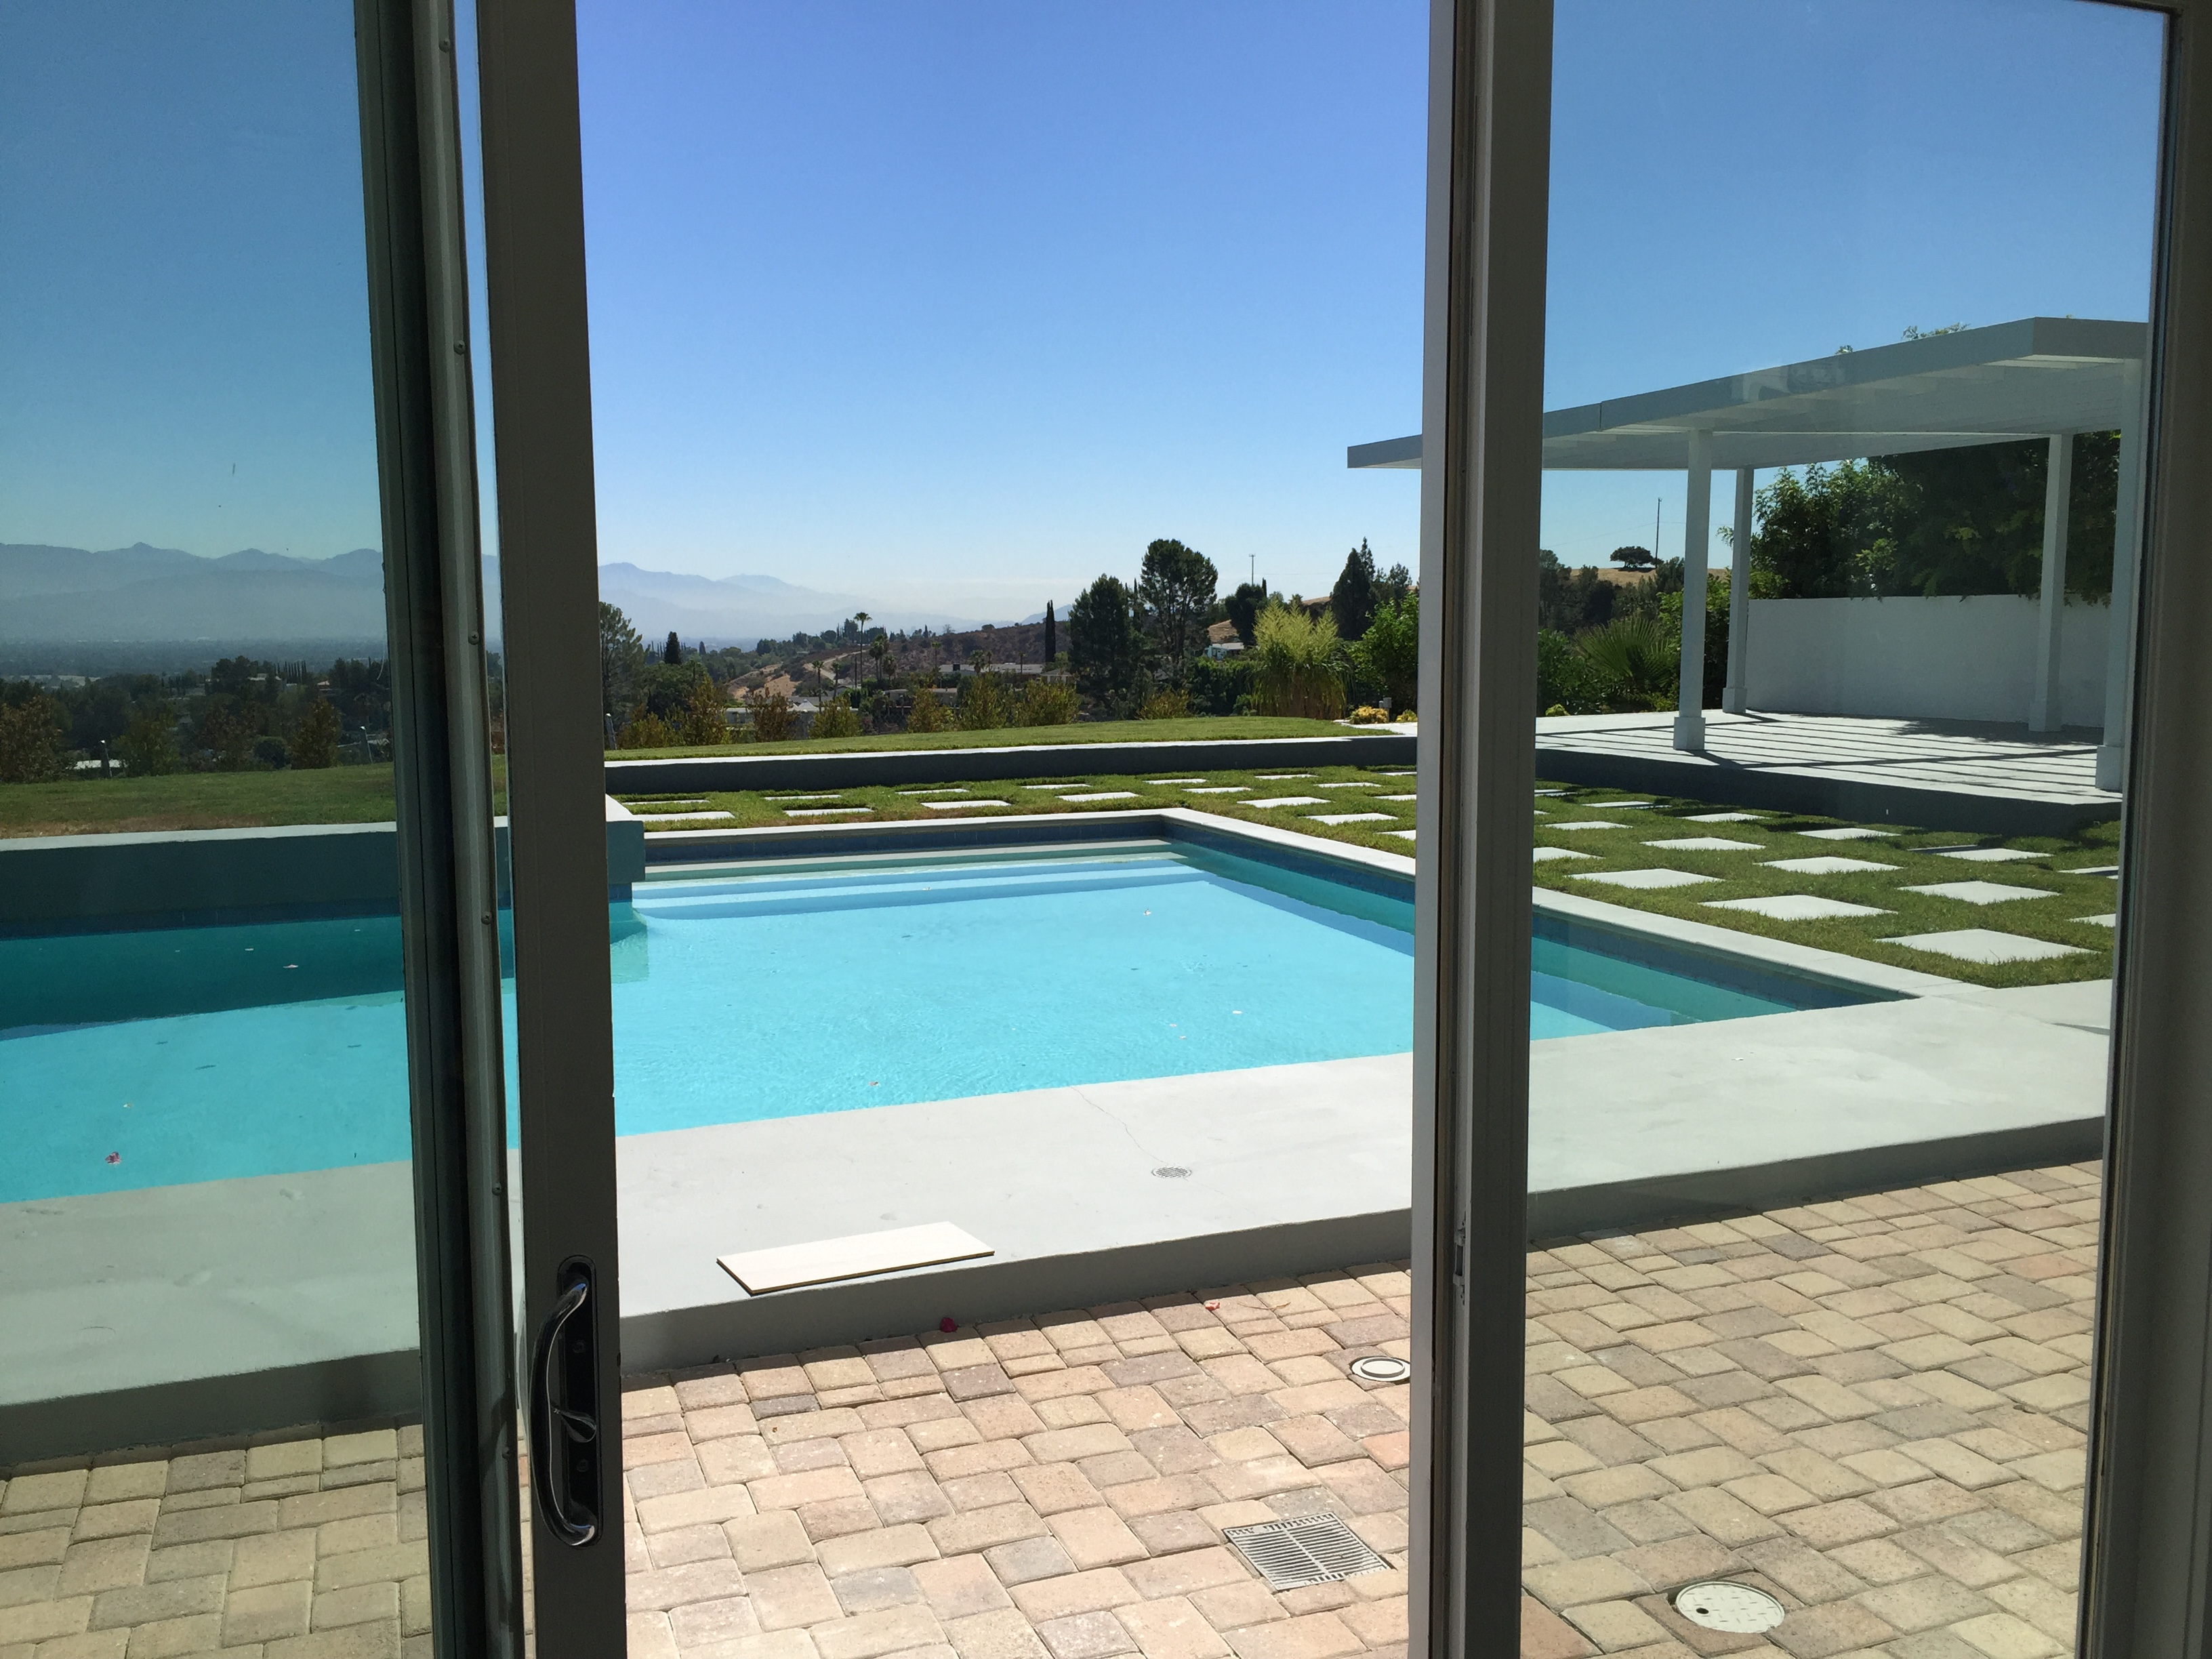 Window Screen Replacement in San Fernando Valley